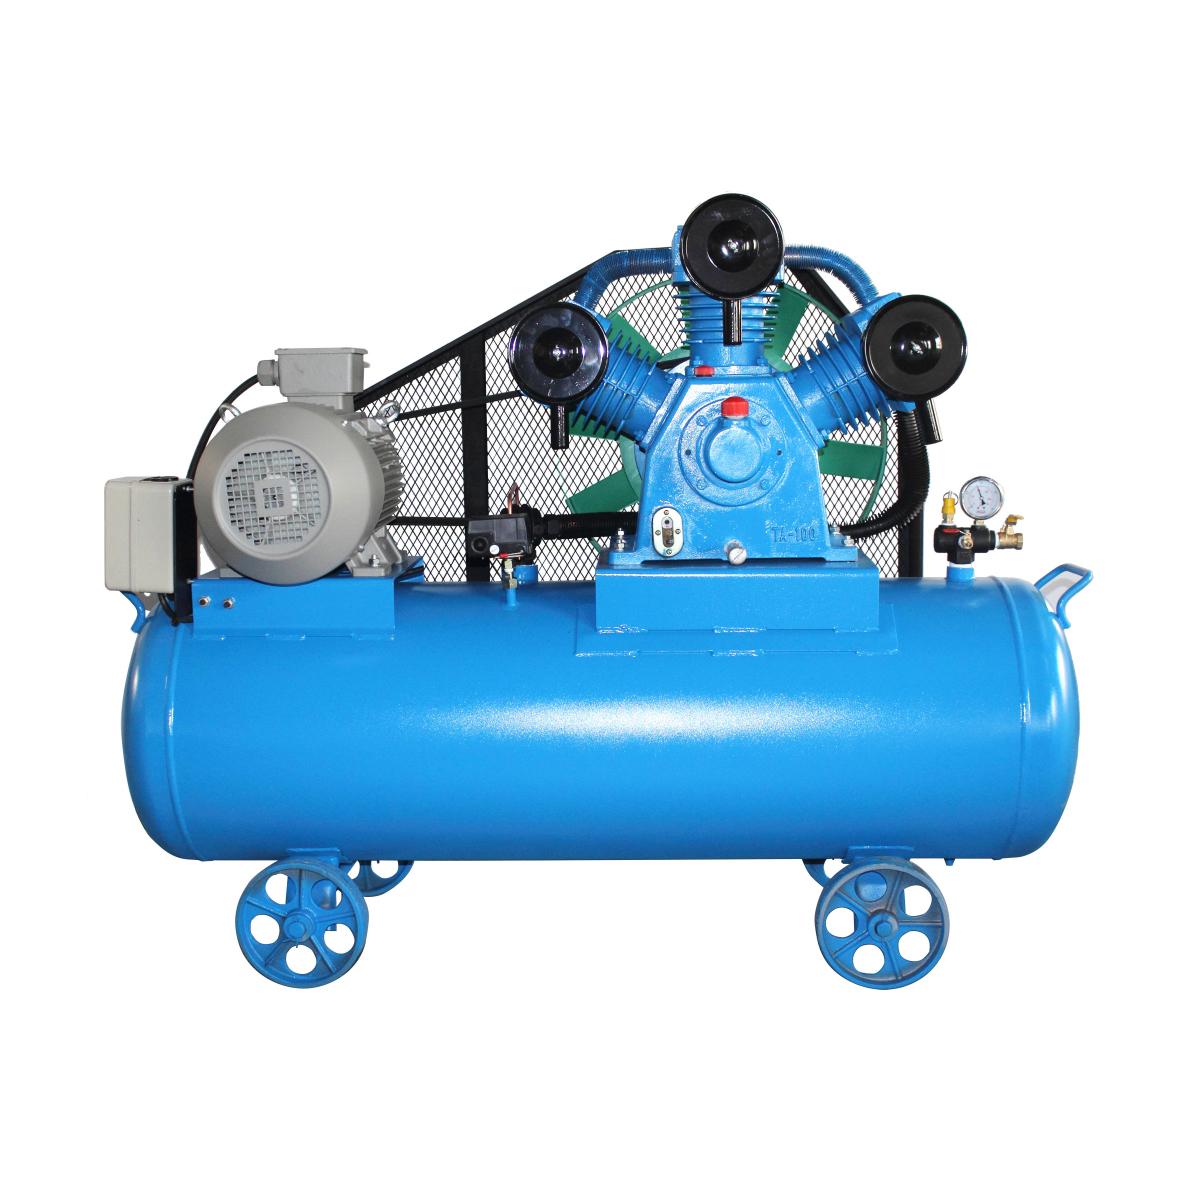 MFT-1.0/7 Air Compressor Machine Featured Image